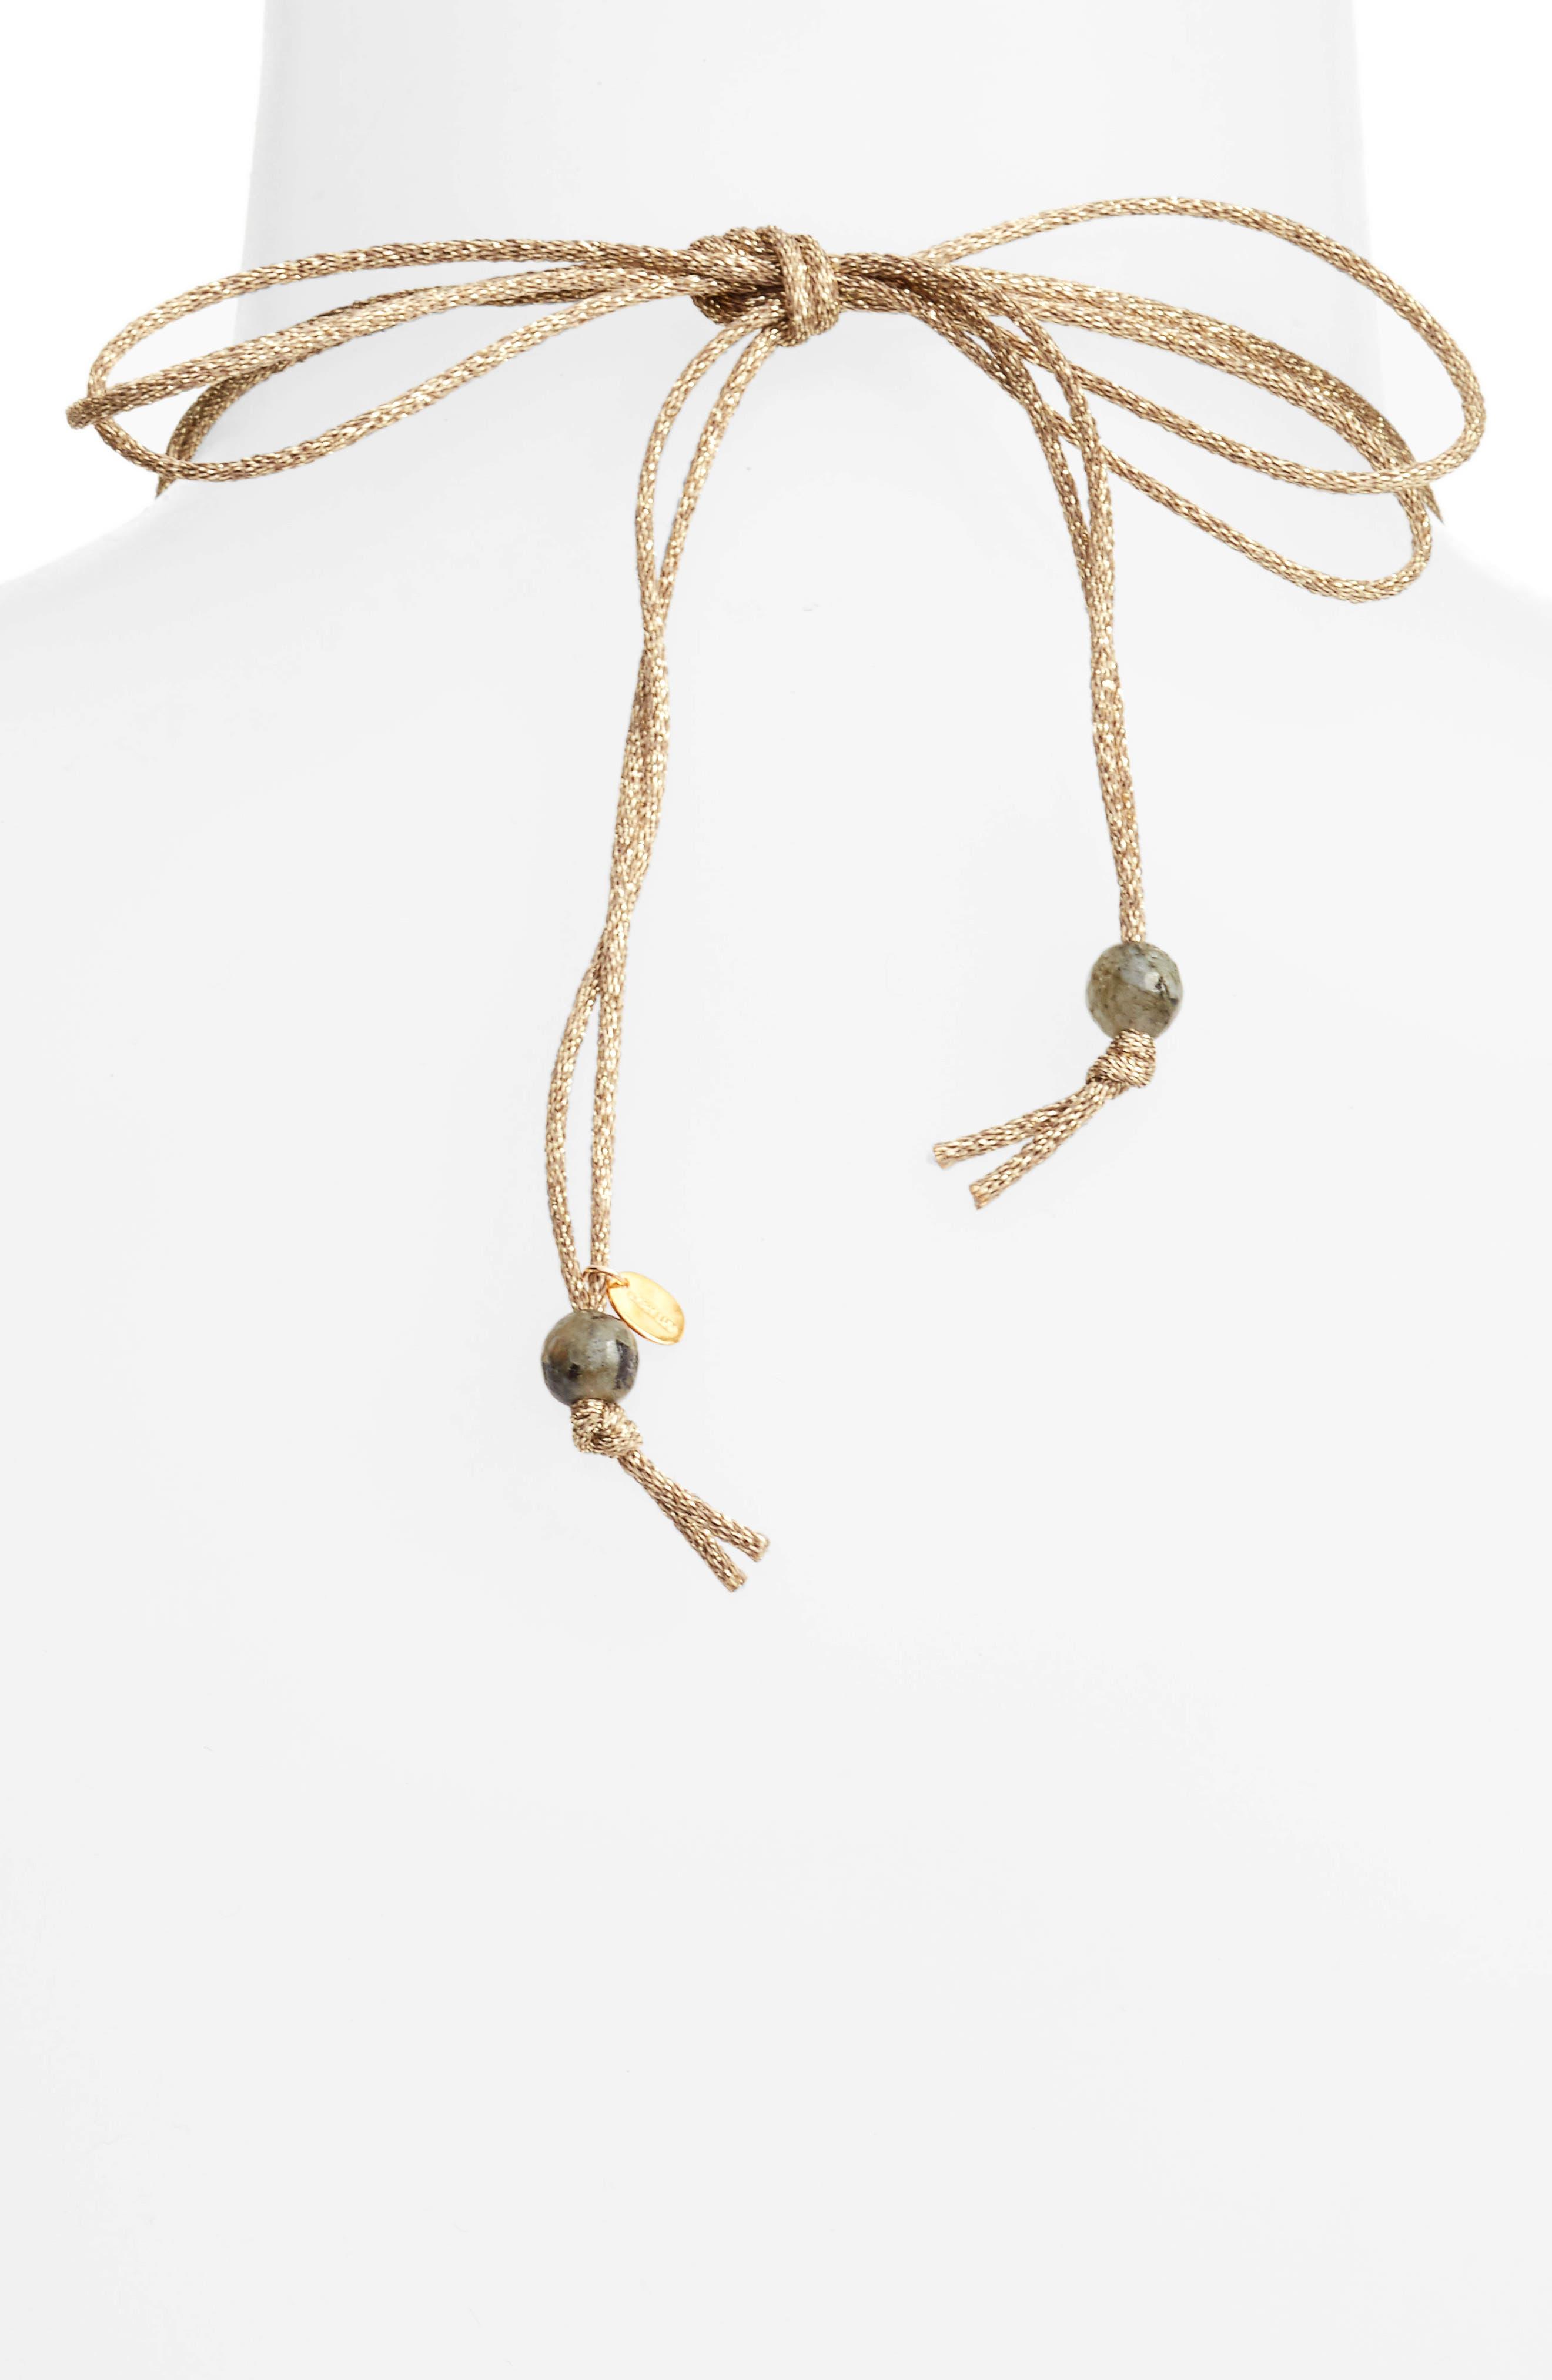 Graduated Semiprecious Stone Necklace,                             Alternate thumbnail 3, color,                             020